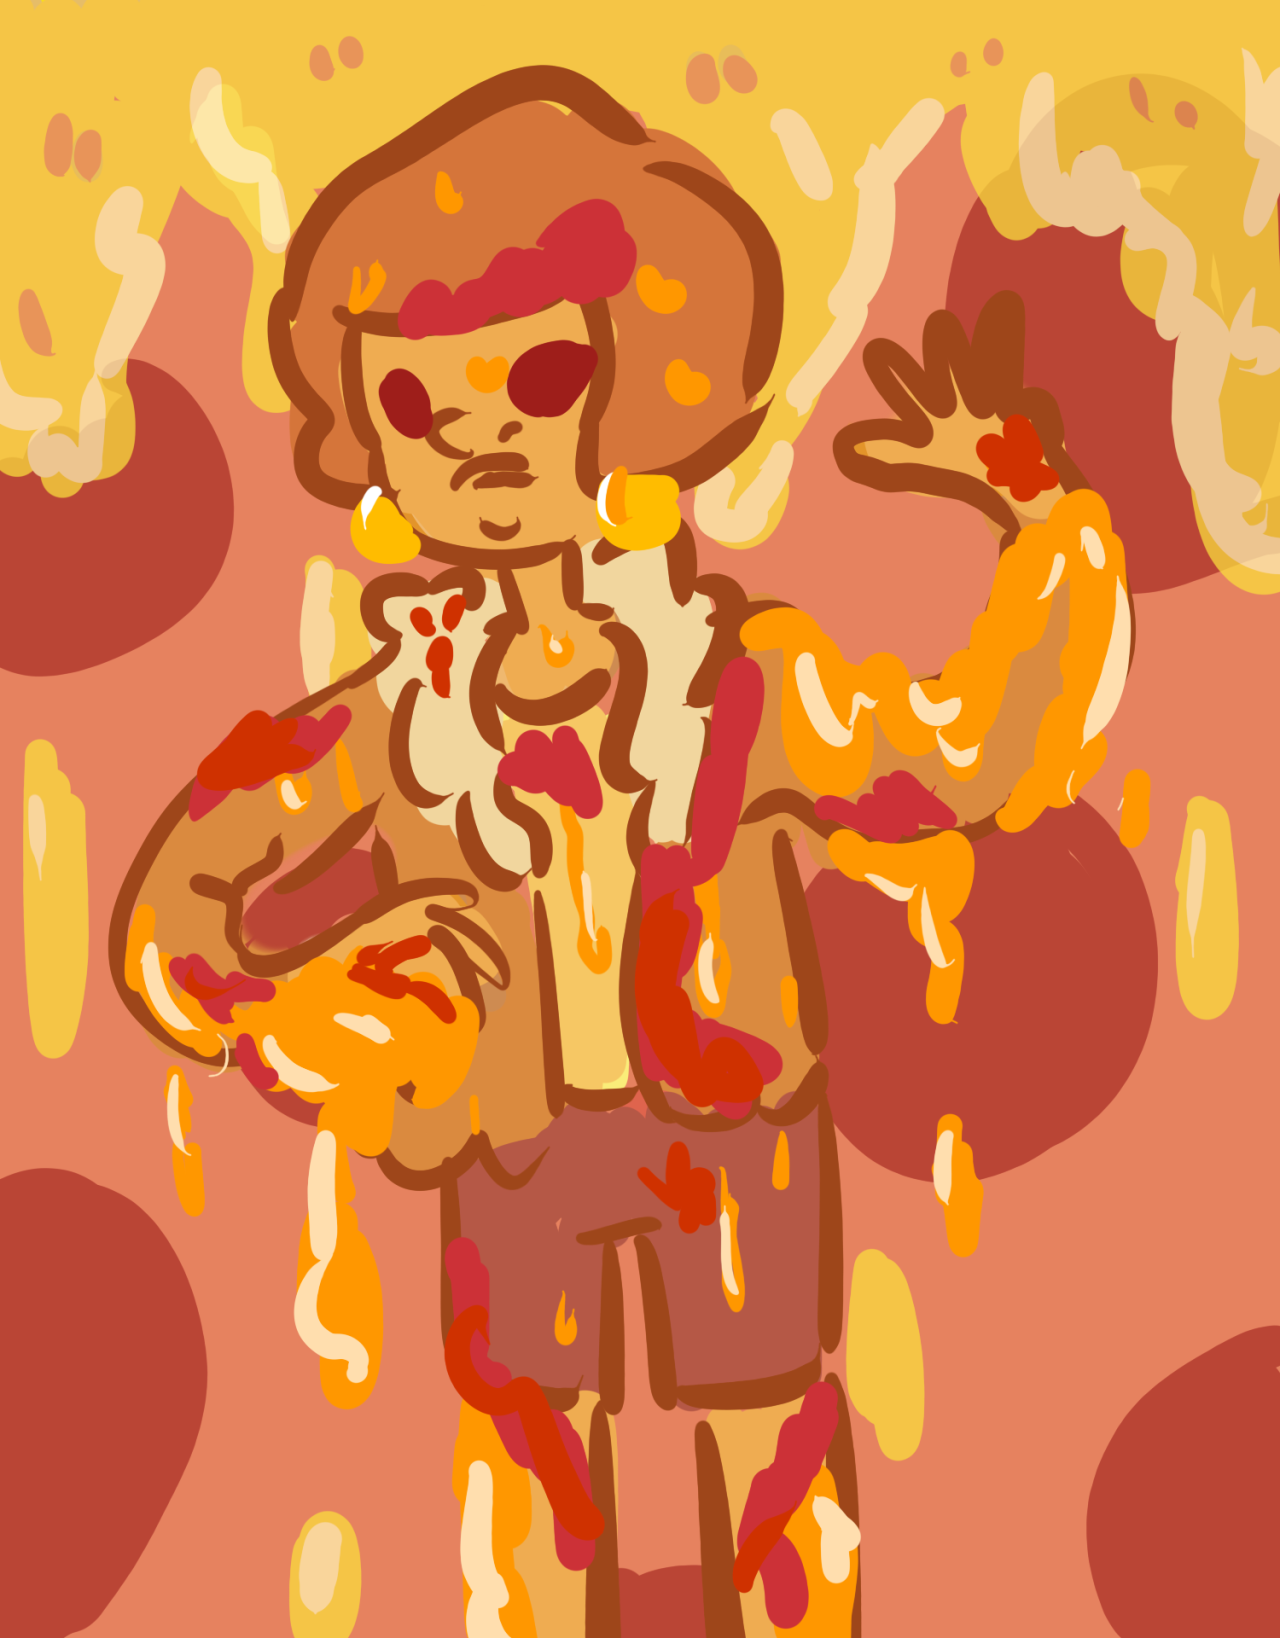 ugh im gonna smell like pizza